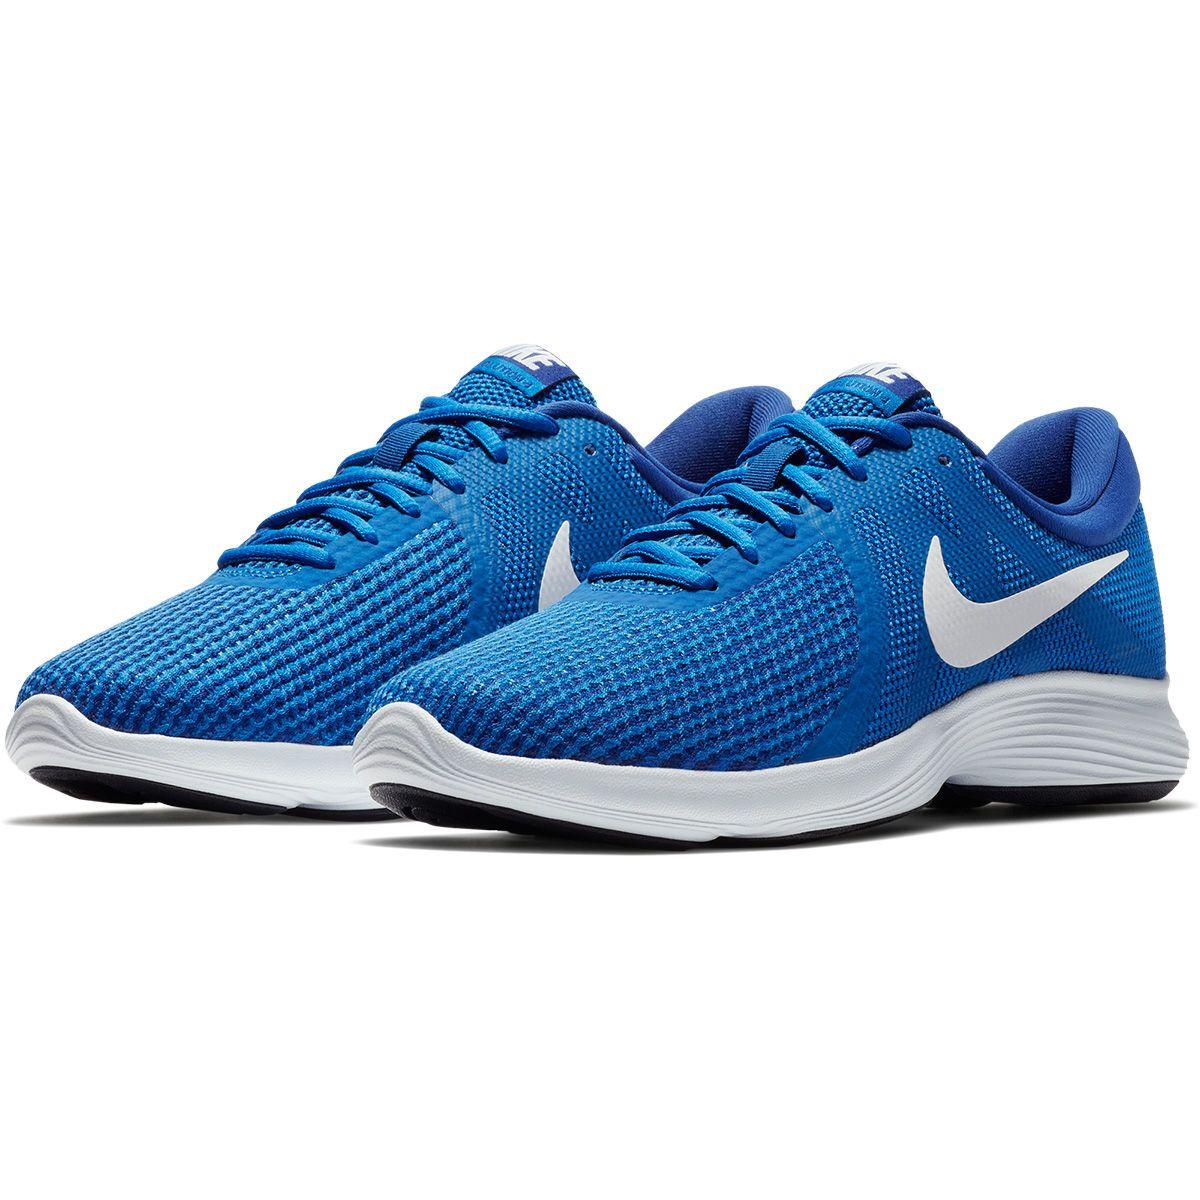 5e19109a964 Tênis Nike Revolution 4 Masculino - Azul Royal